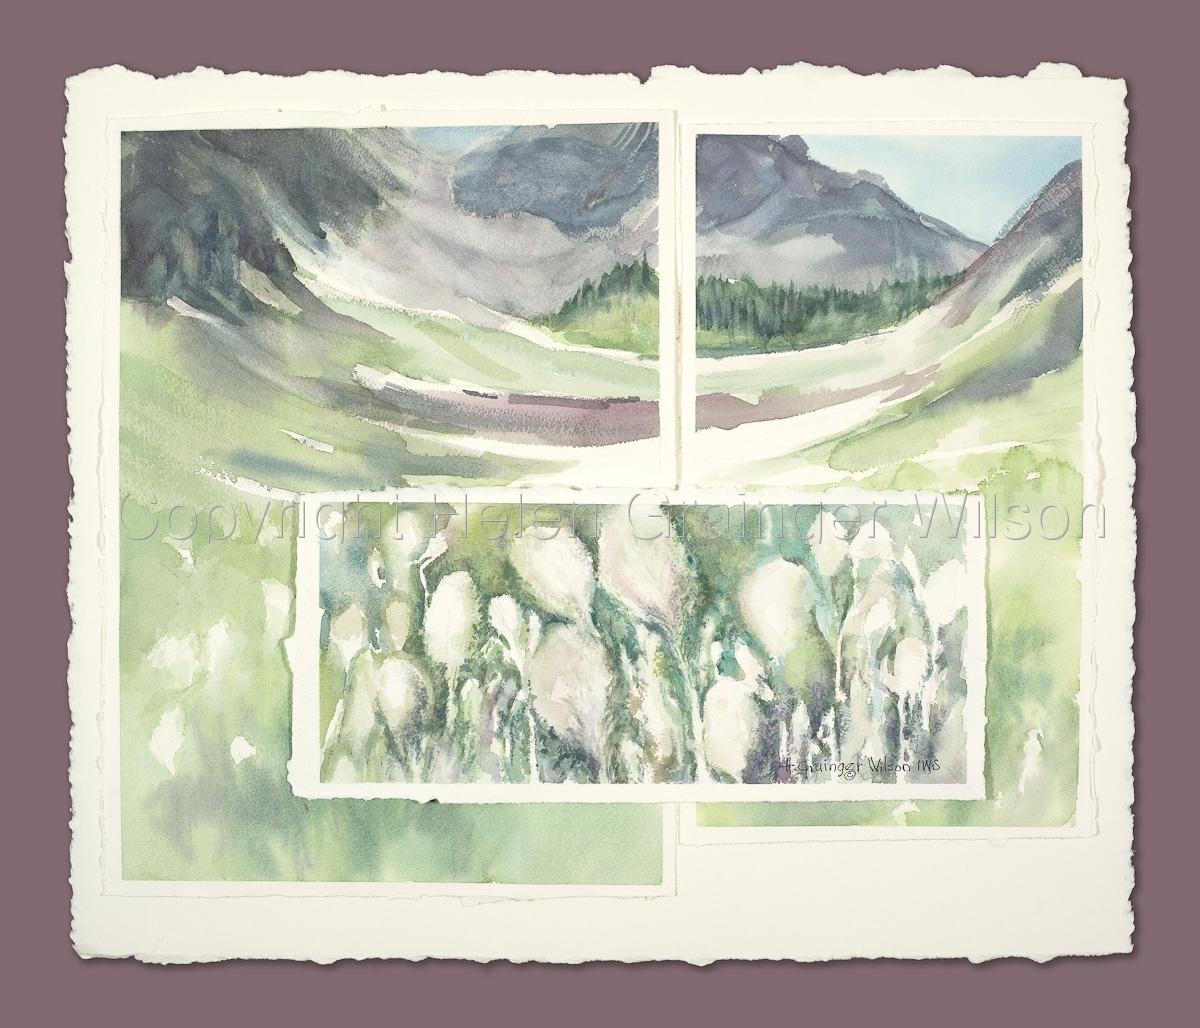 Waterton Beargrass by Helen Grainger Wilson (large view)